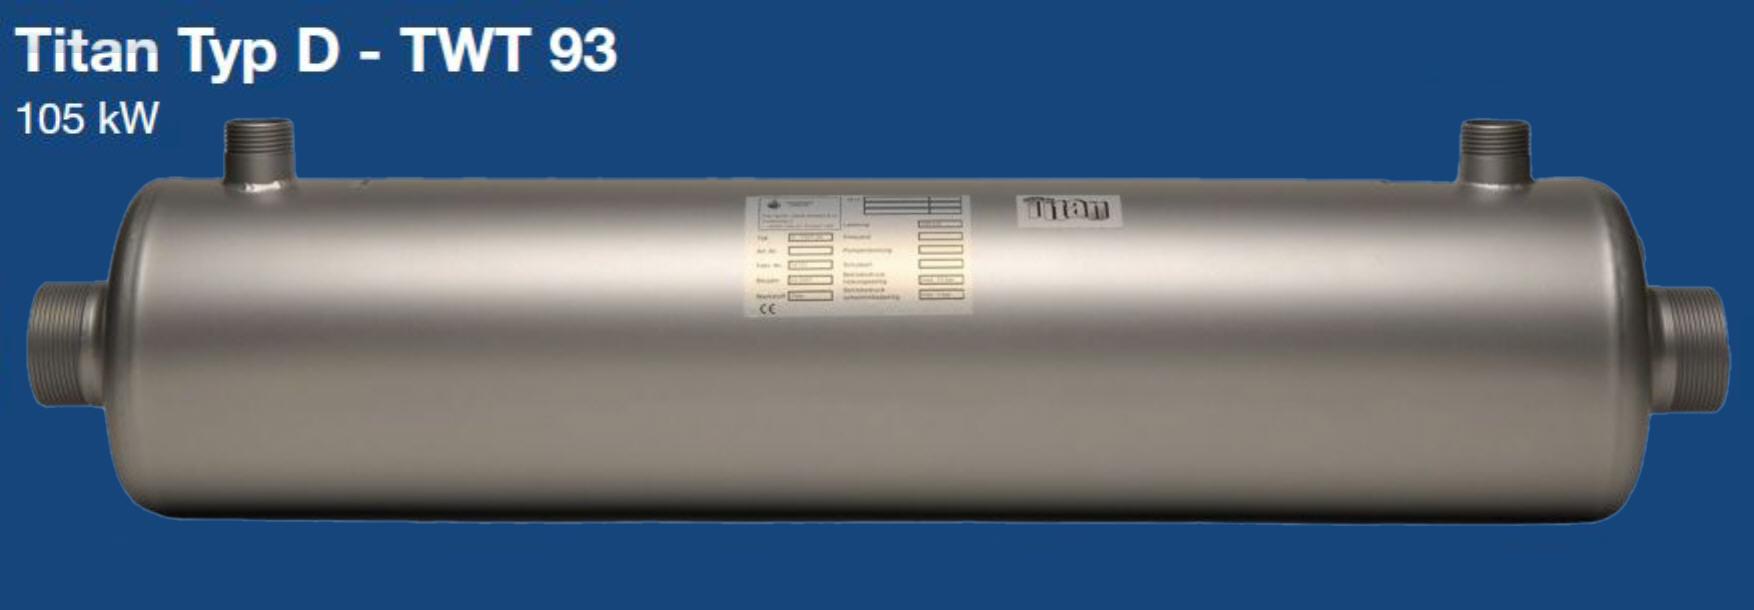 Daprà Titan Heizungs-Wärme-Tauscher D-TWT 93 kW Killus-Technik.de